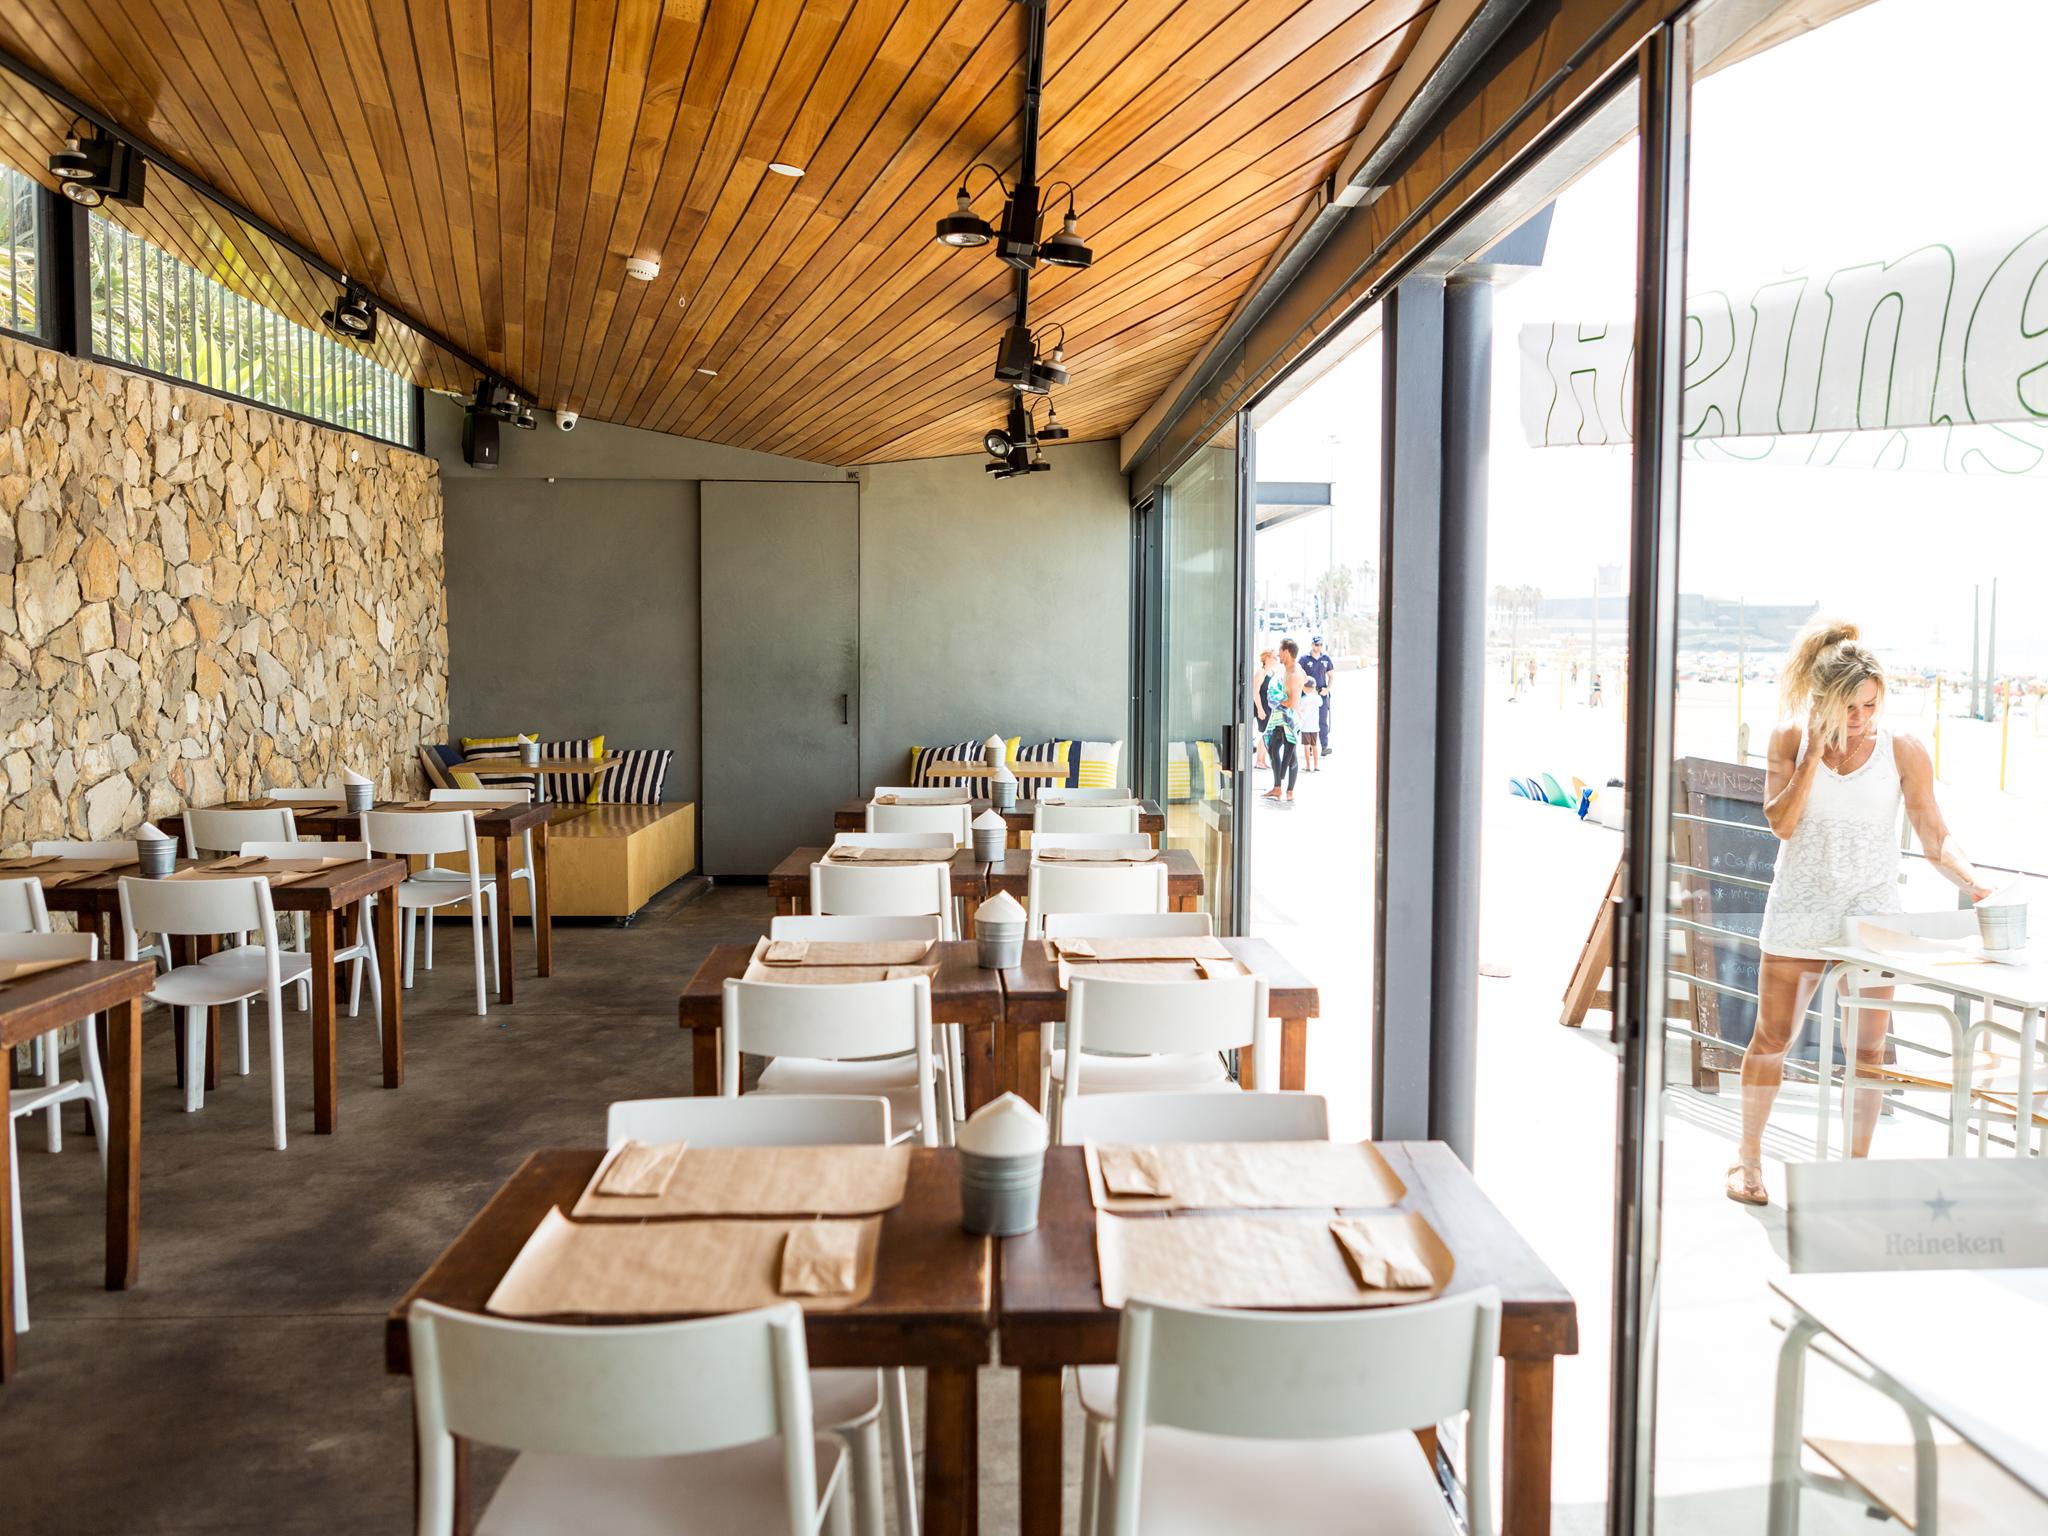 Windsurf Café